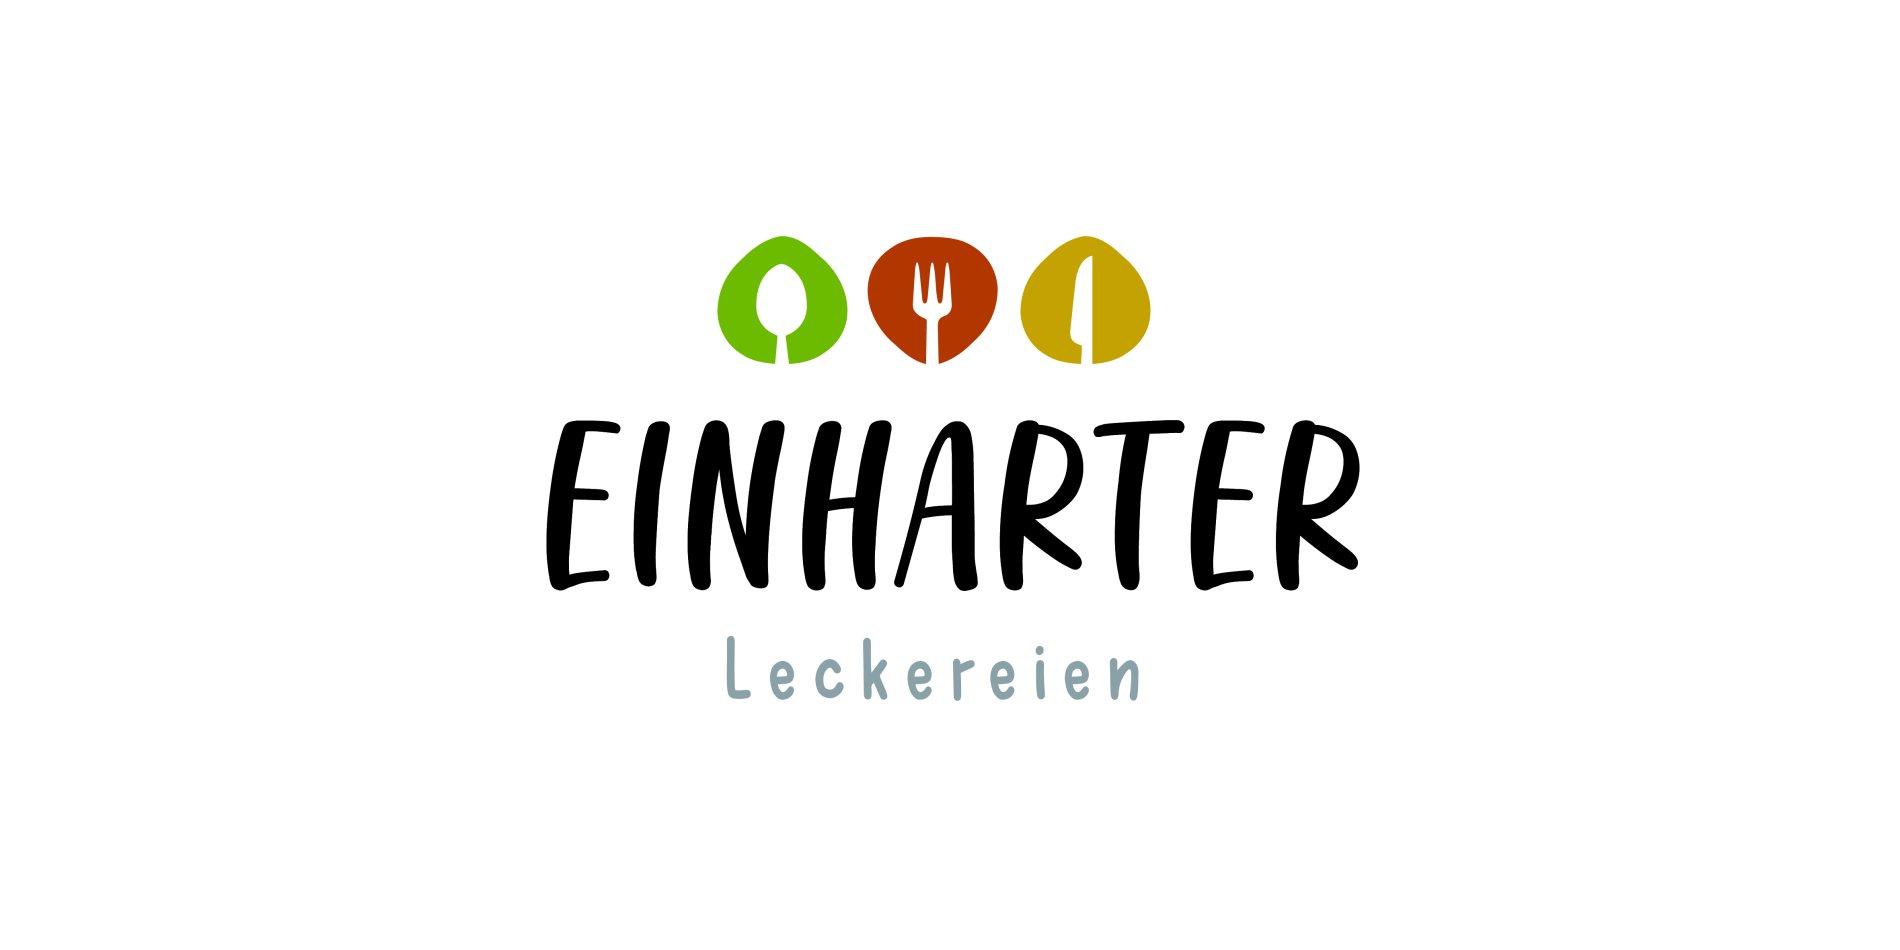 Einharter Leckereien Logo